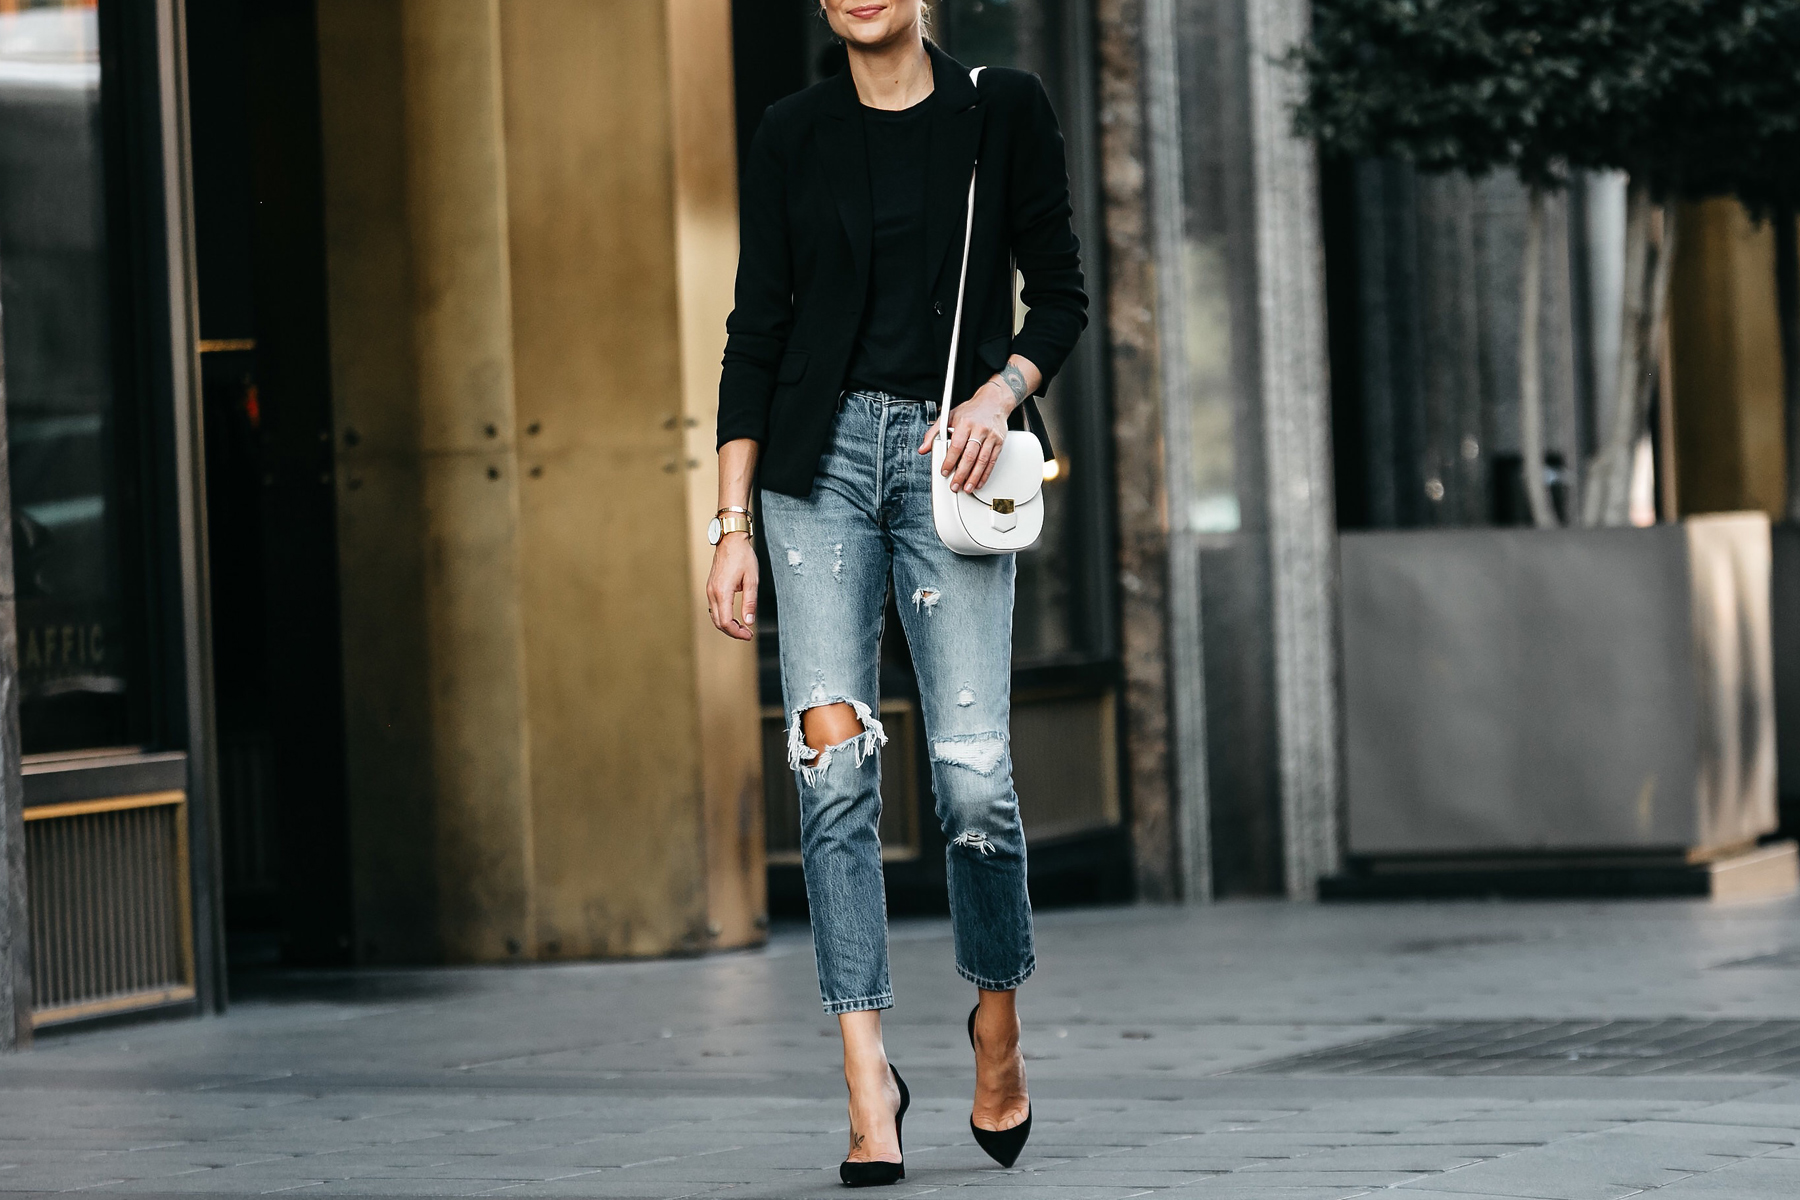 Black Blazer Black Tshirt Denim Ripped Jeans Outfit Christian Louboutin Black Pumps Celine Trotteur White Handbag Fashion Jackson Dallas Blogger Fashion Blogger Street Style